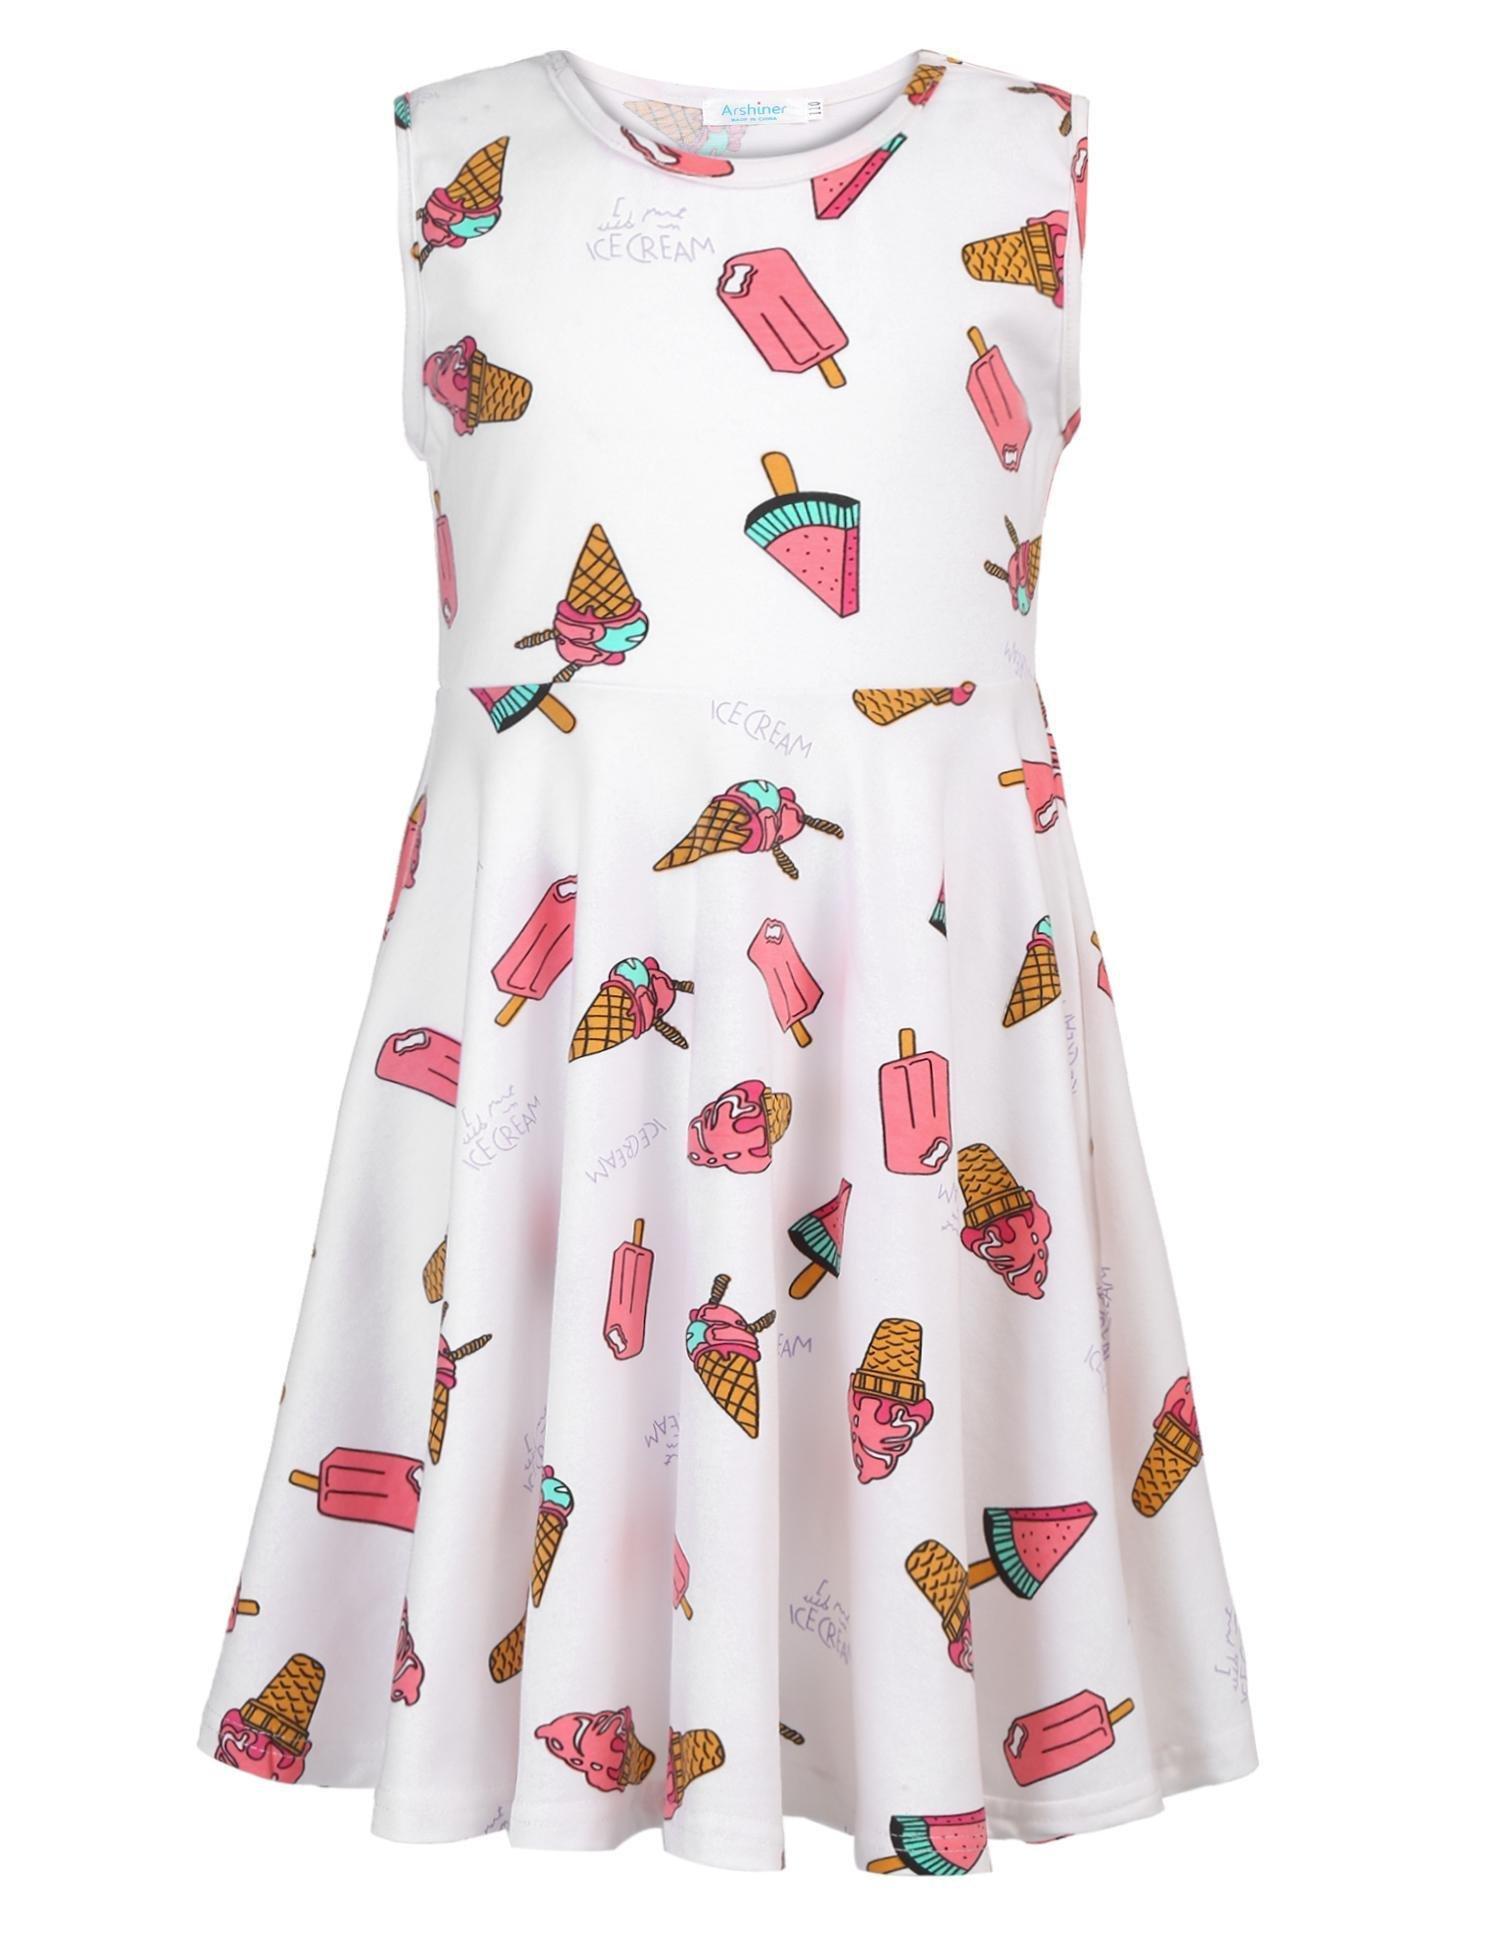 Arshiner Girls Sleeveless Tank Swing A-line High Waist Casual Dress